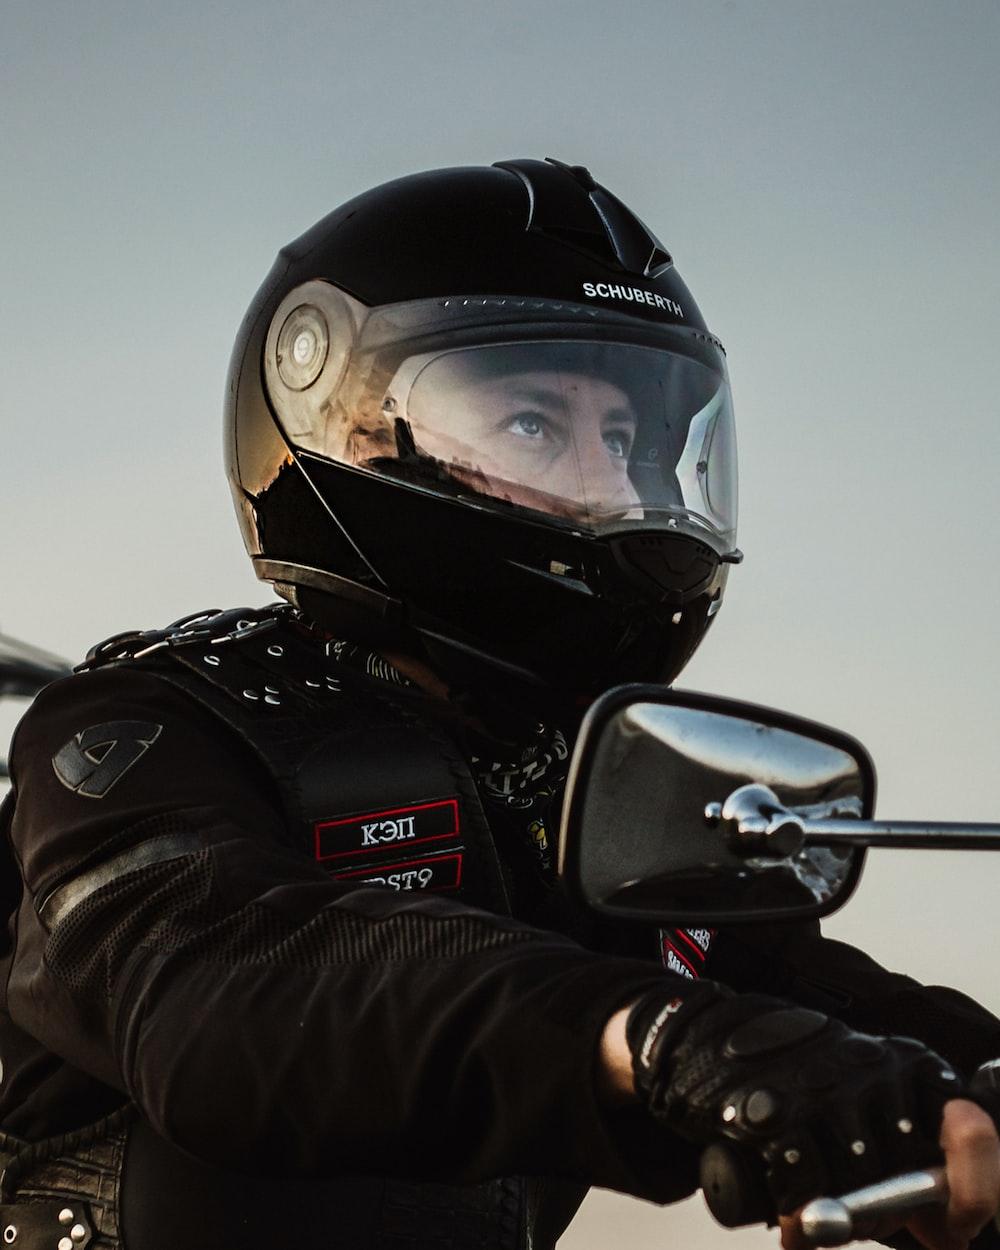 man wearing black helmet riding on motorcycle